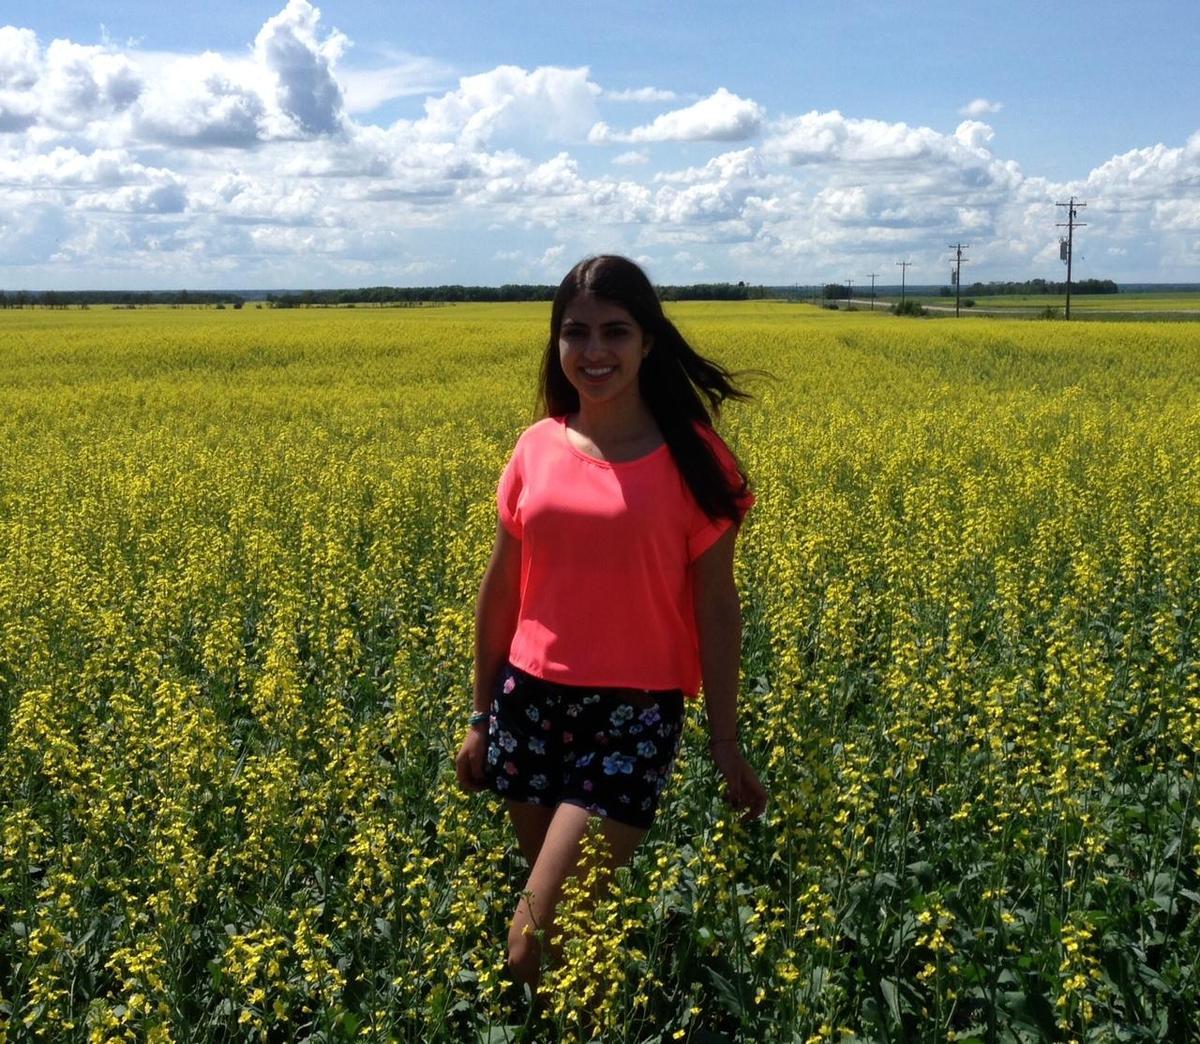 Canola Field in the Prairies